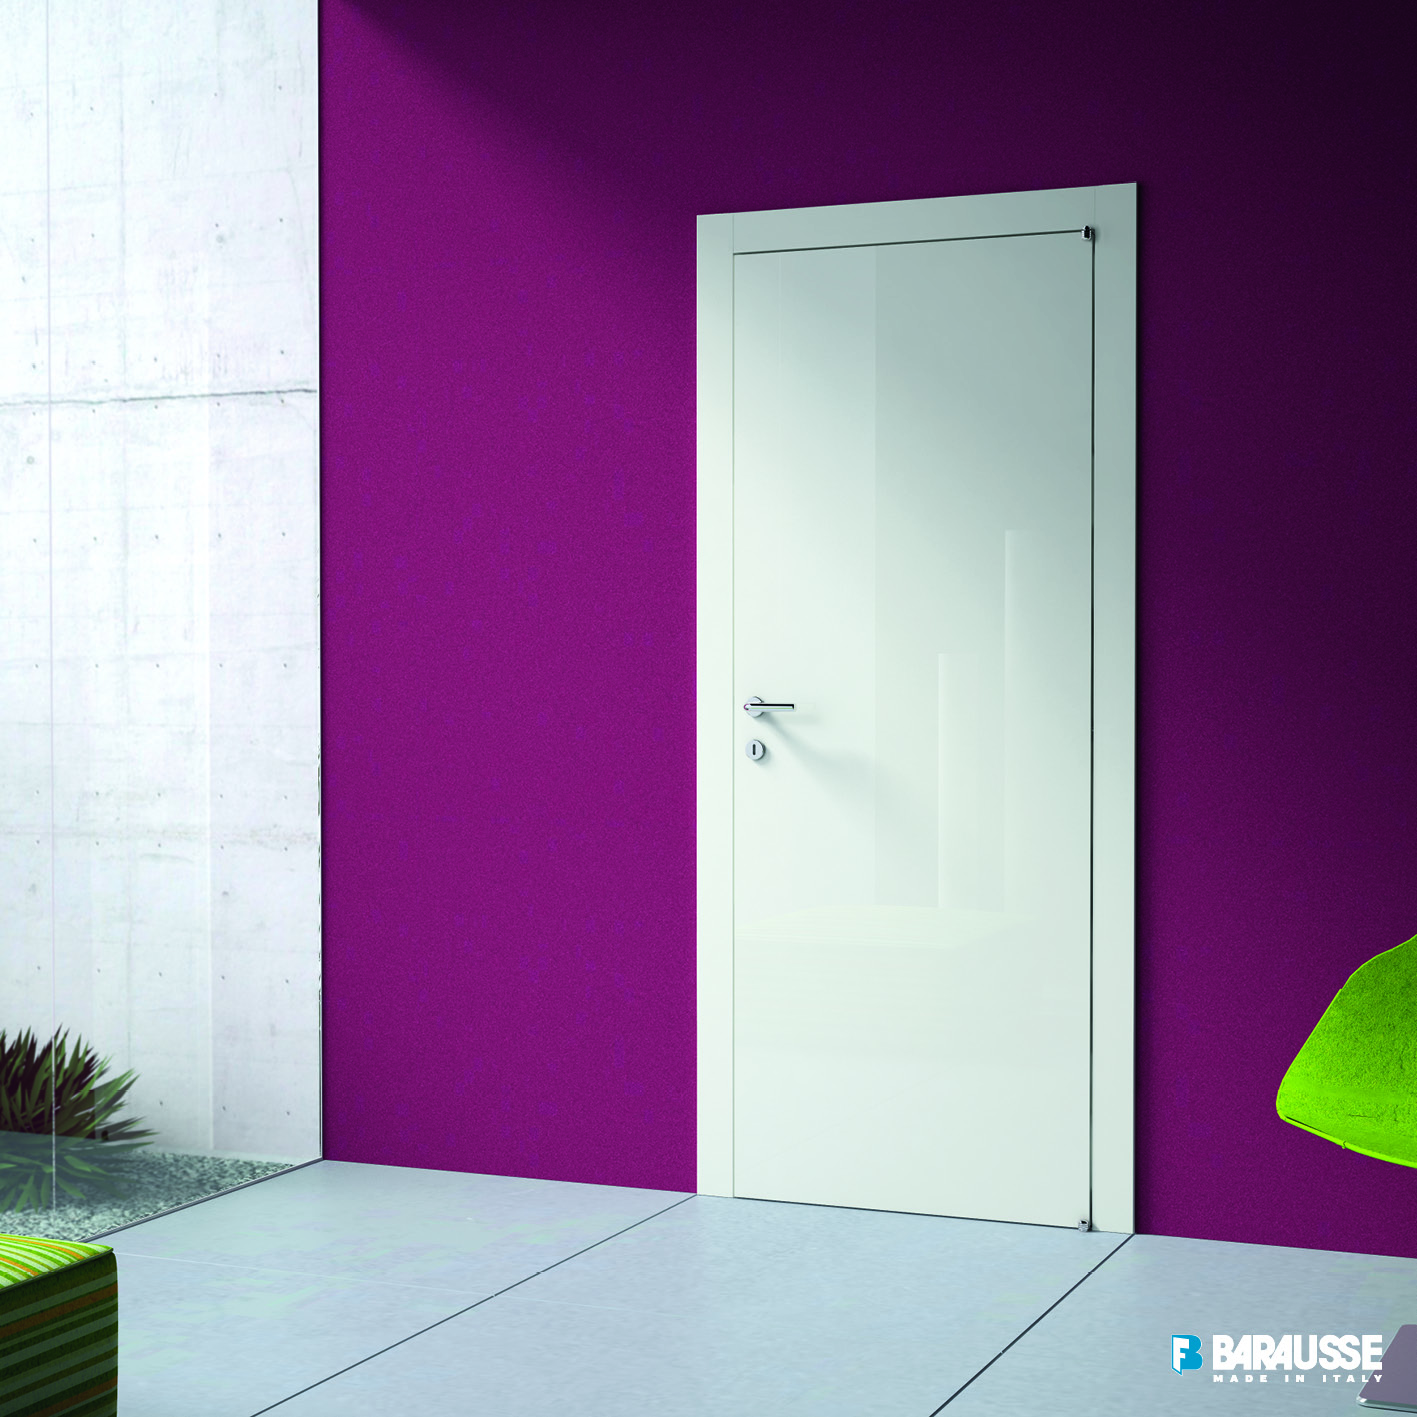 Exclusive Home Interiors-23